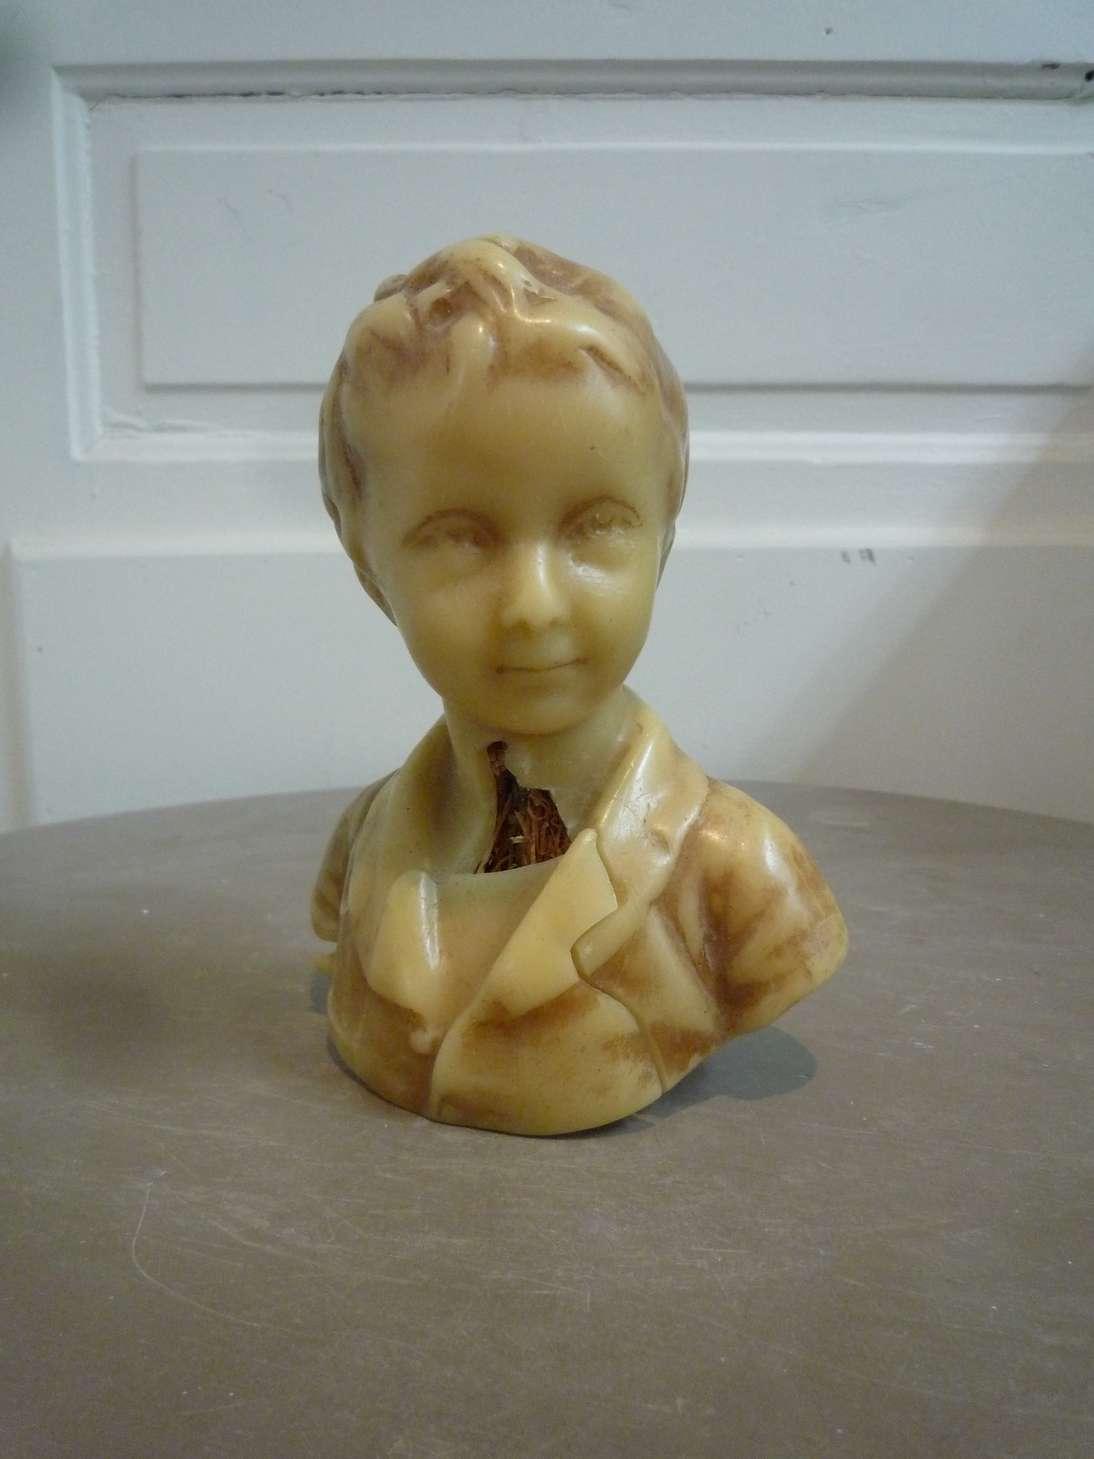 Alexandre-brongniart-buste-cire-sculpture-enfant-louise-houdon-sèvres-art-restauration-restaurarte.jpg